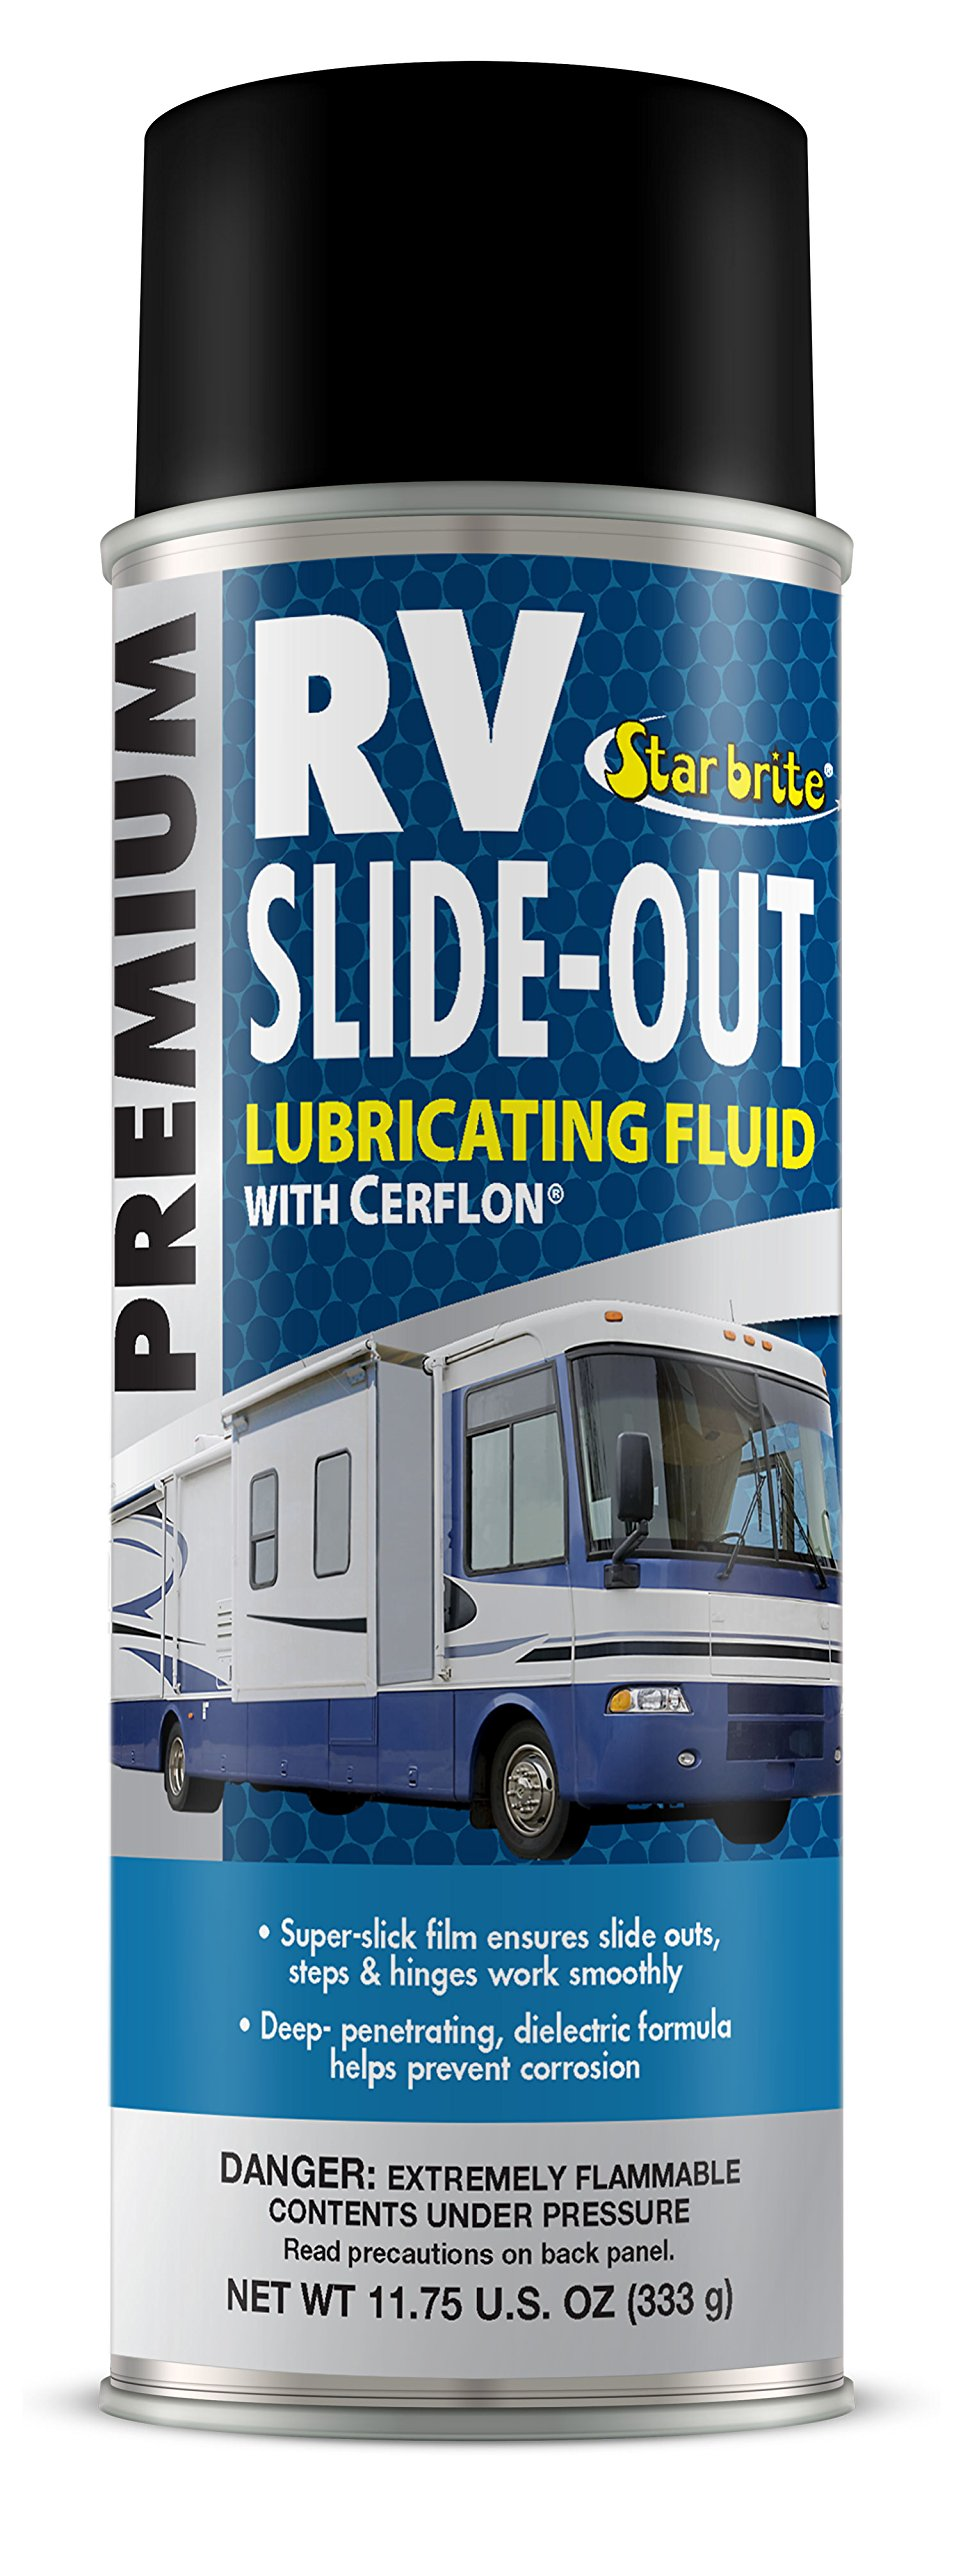 Star Brite 78212 Premium RV Slide-Out Lubricating Fluid - 12 oz.